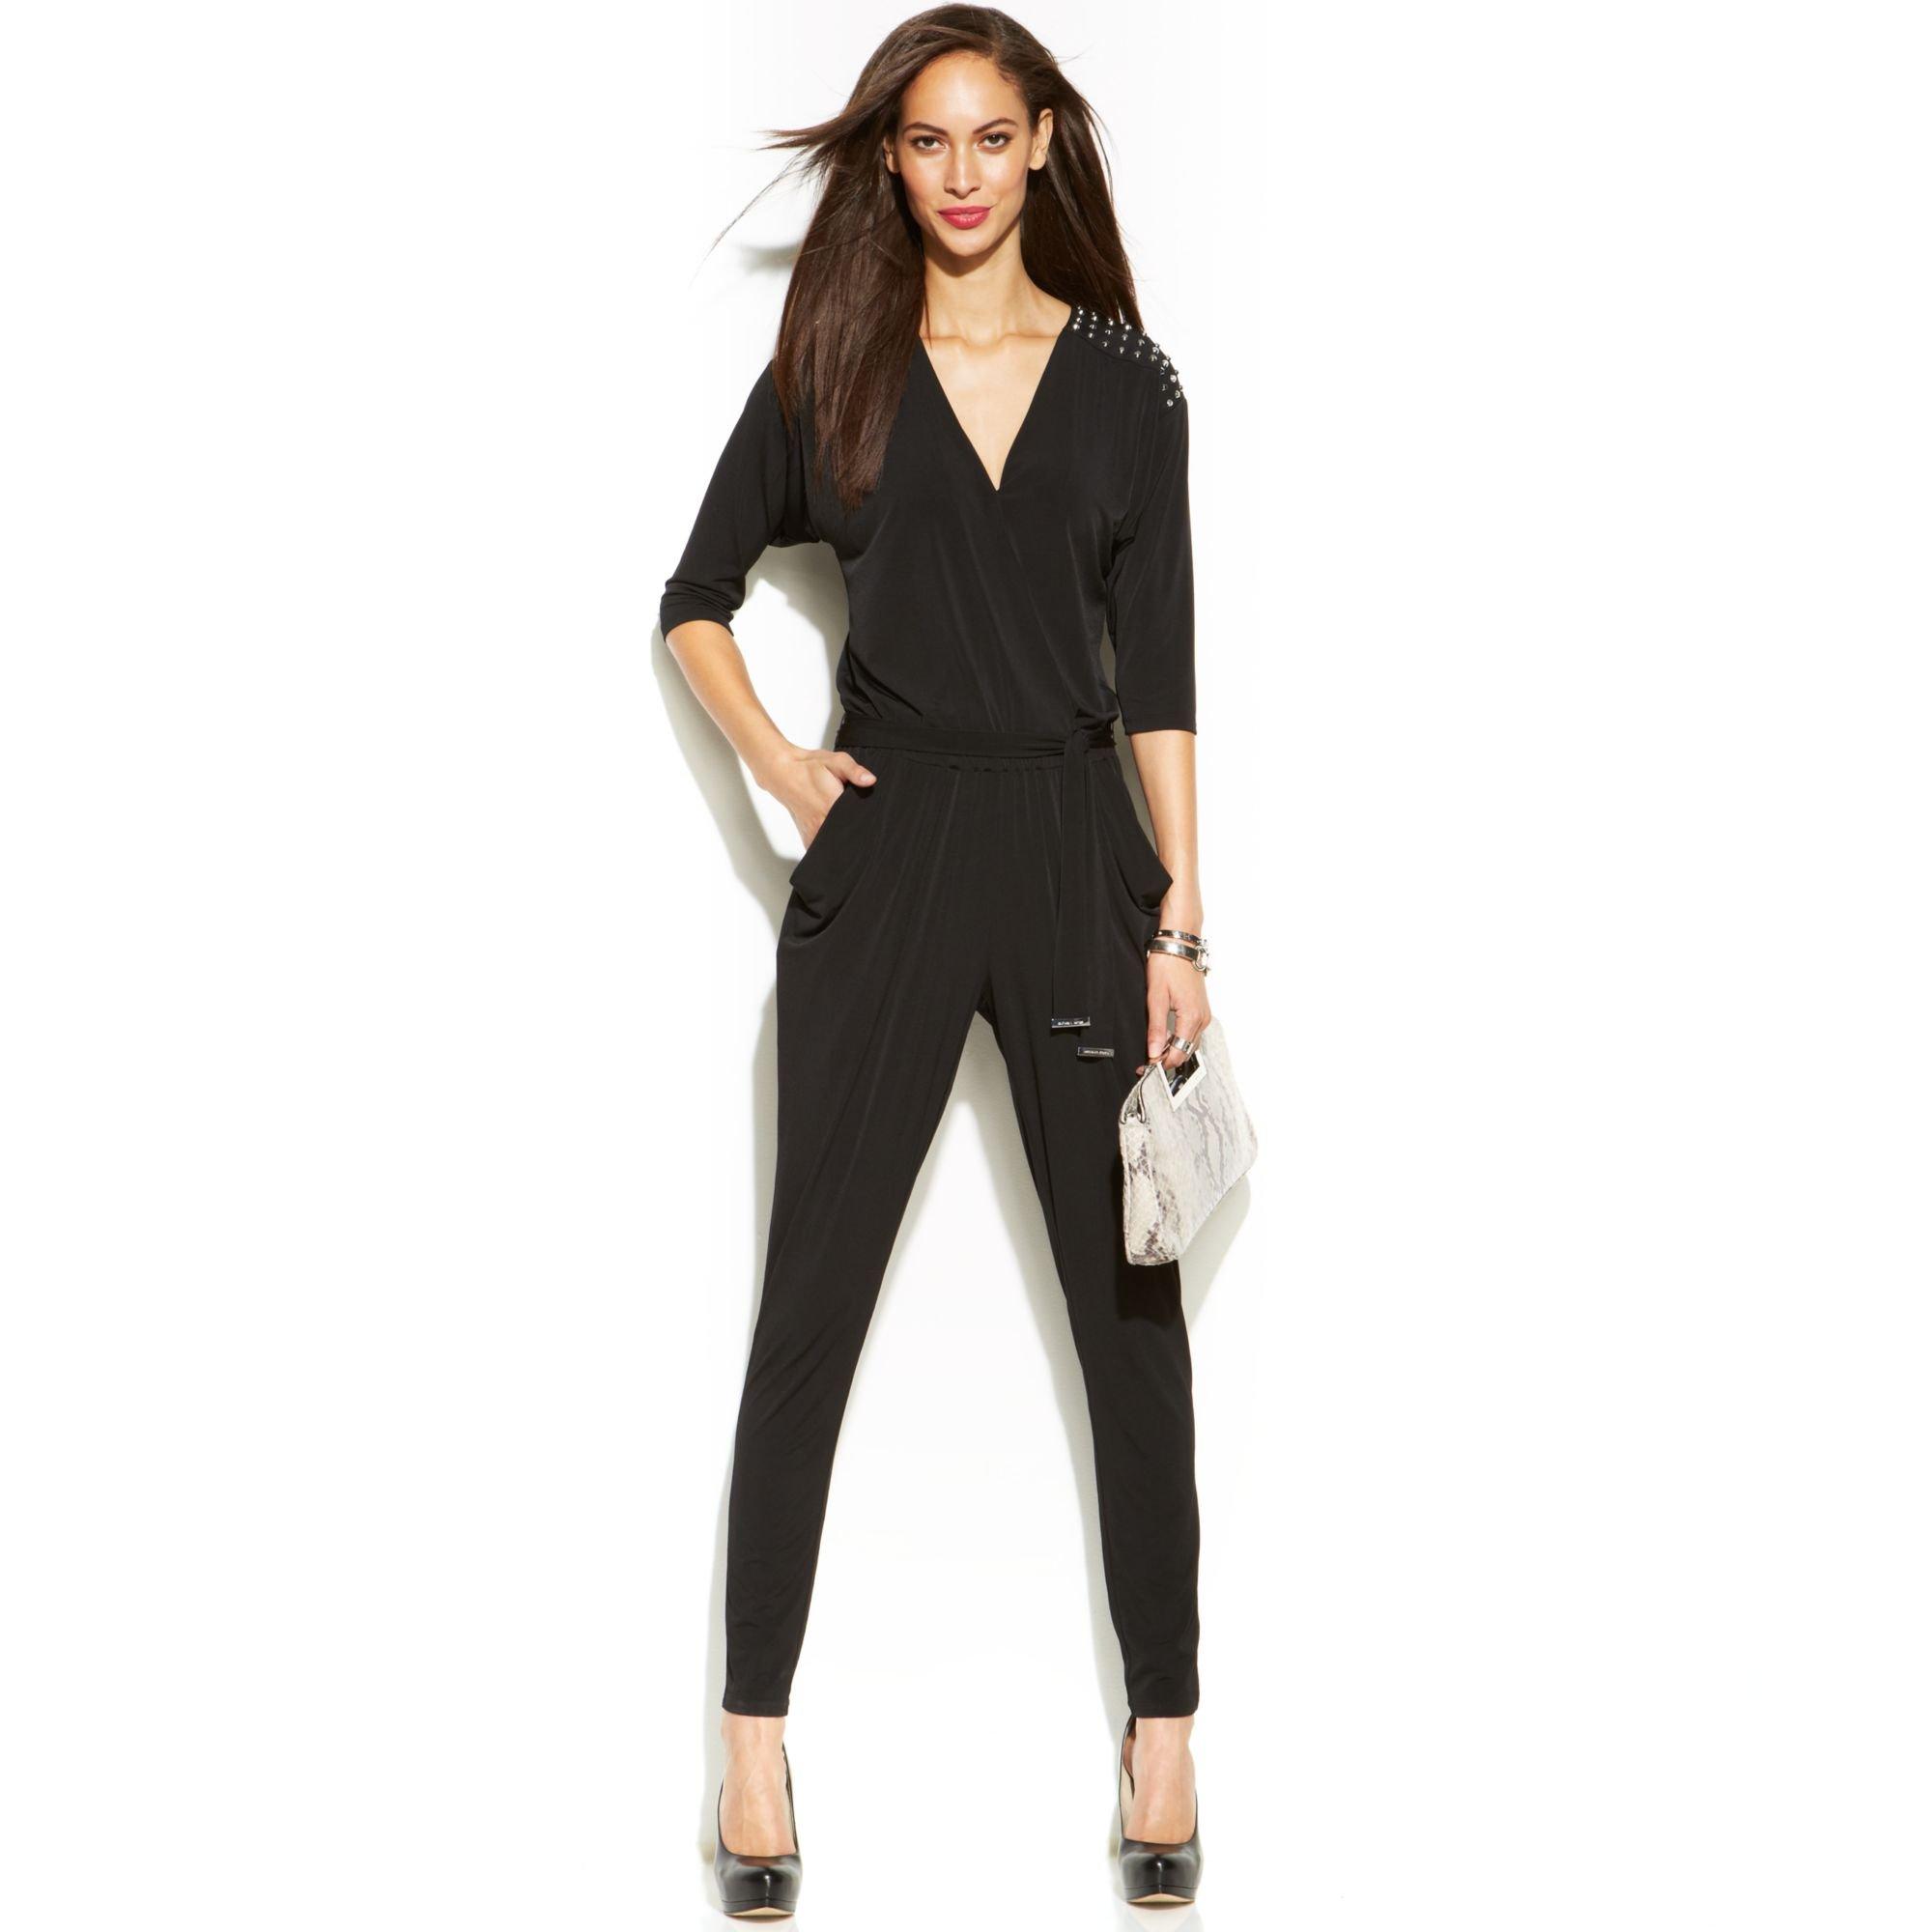 michael kors michael slimleg studded jumpsuit in black lyst. Black Bedroom Furniture Sets. Home Design Ideas